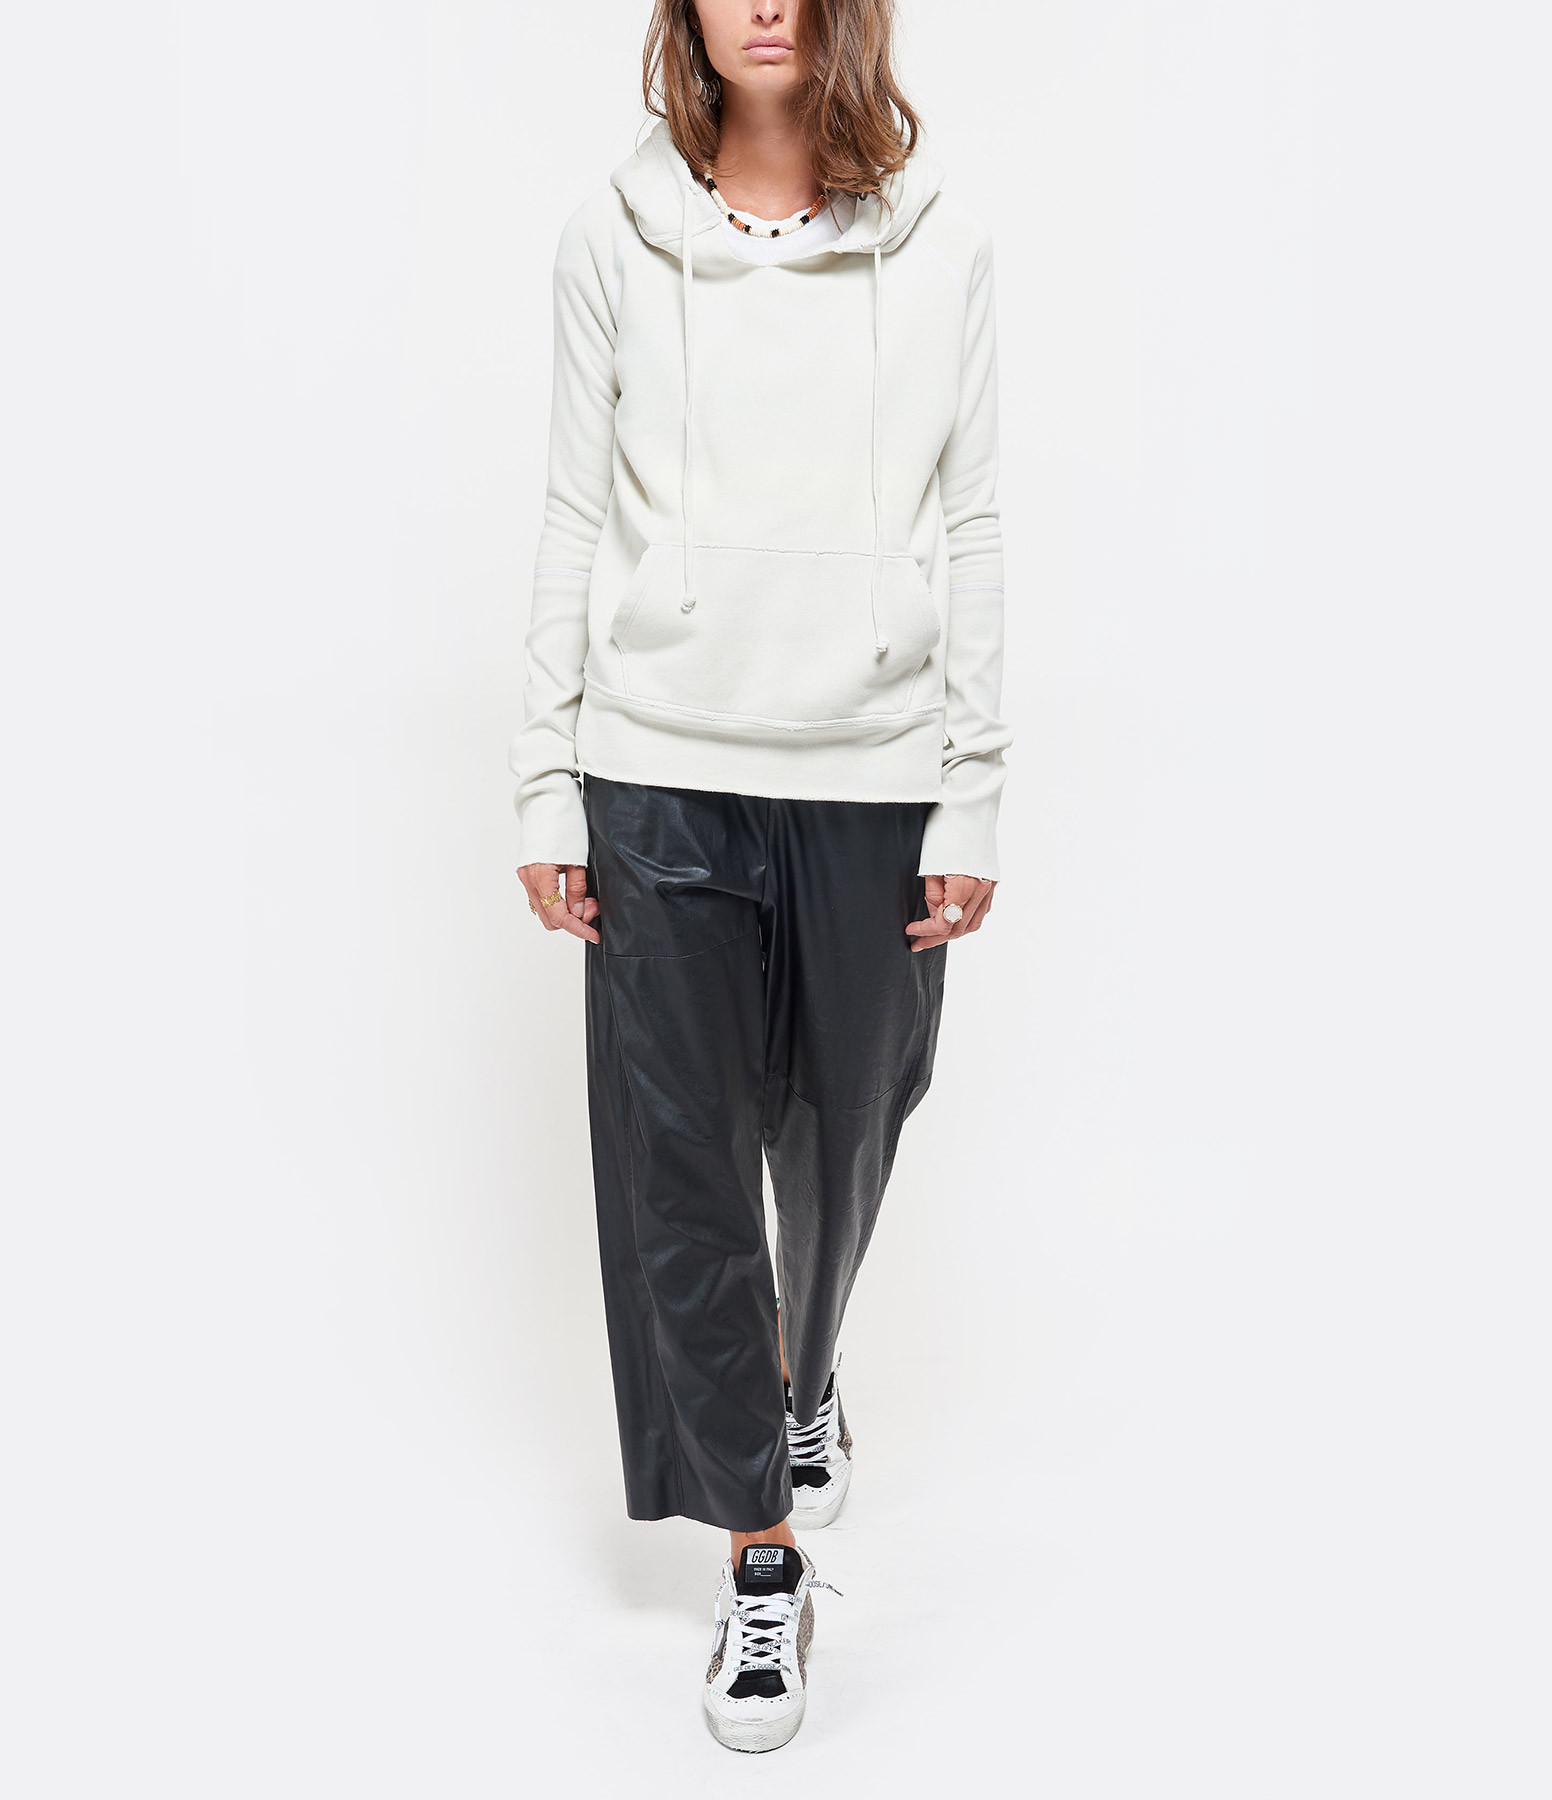 NILI LOTAN - Sweatshirt Janie Blanc Craie